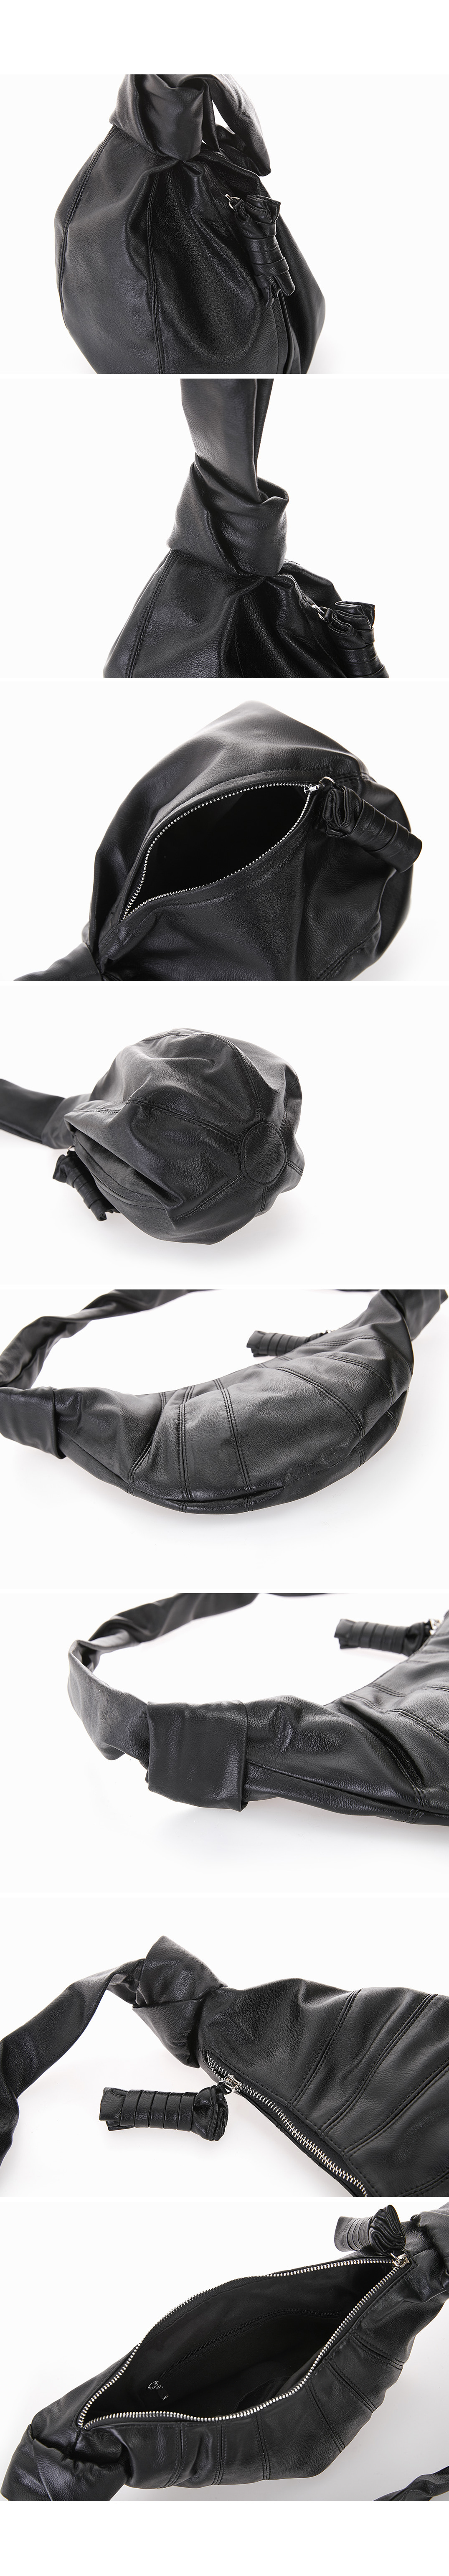 Rugby handbag